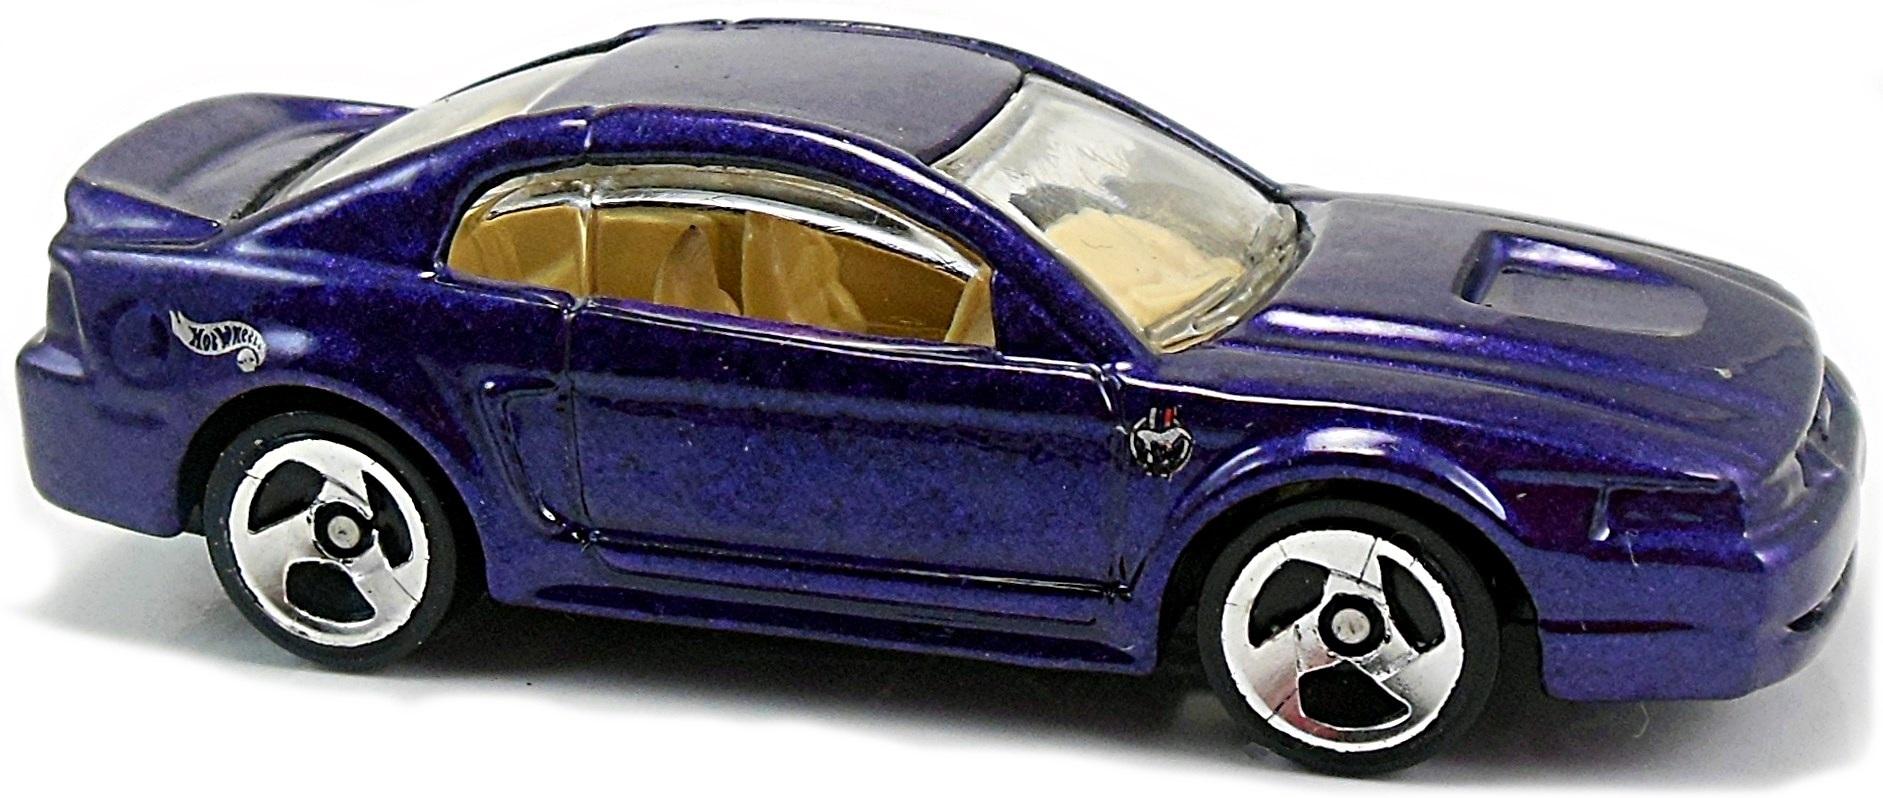 99 Mustang (GT) (i)   Hot Wheels Newsletter